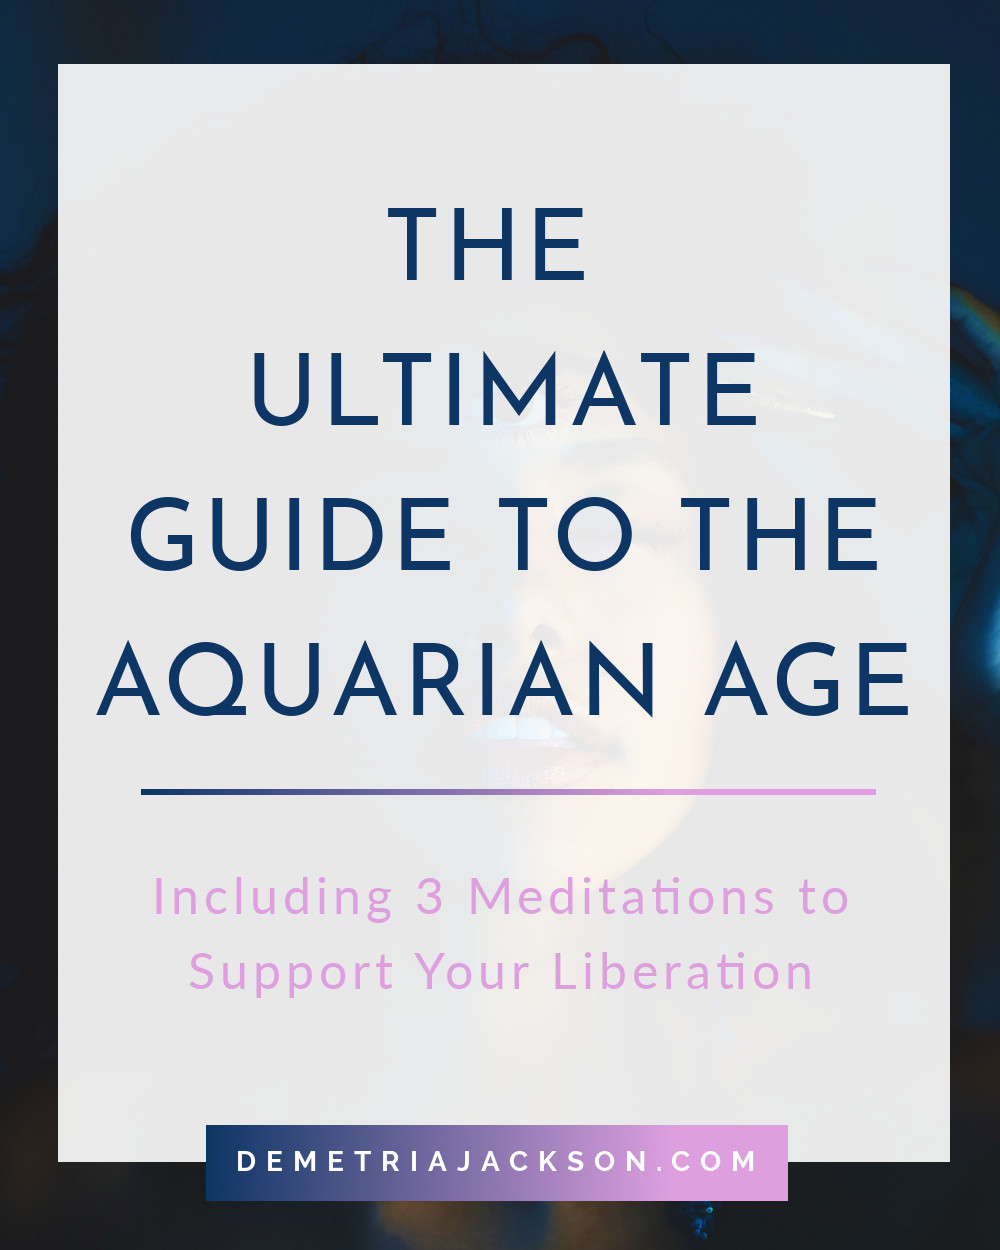 blog-thumbnail-ultimate-guide-aquarian-age.jpeg